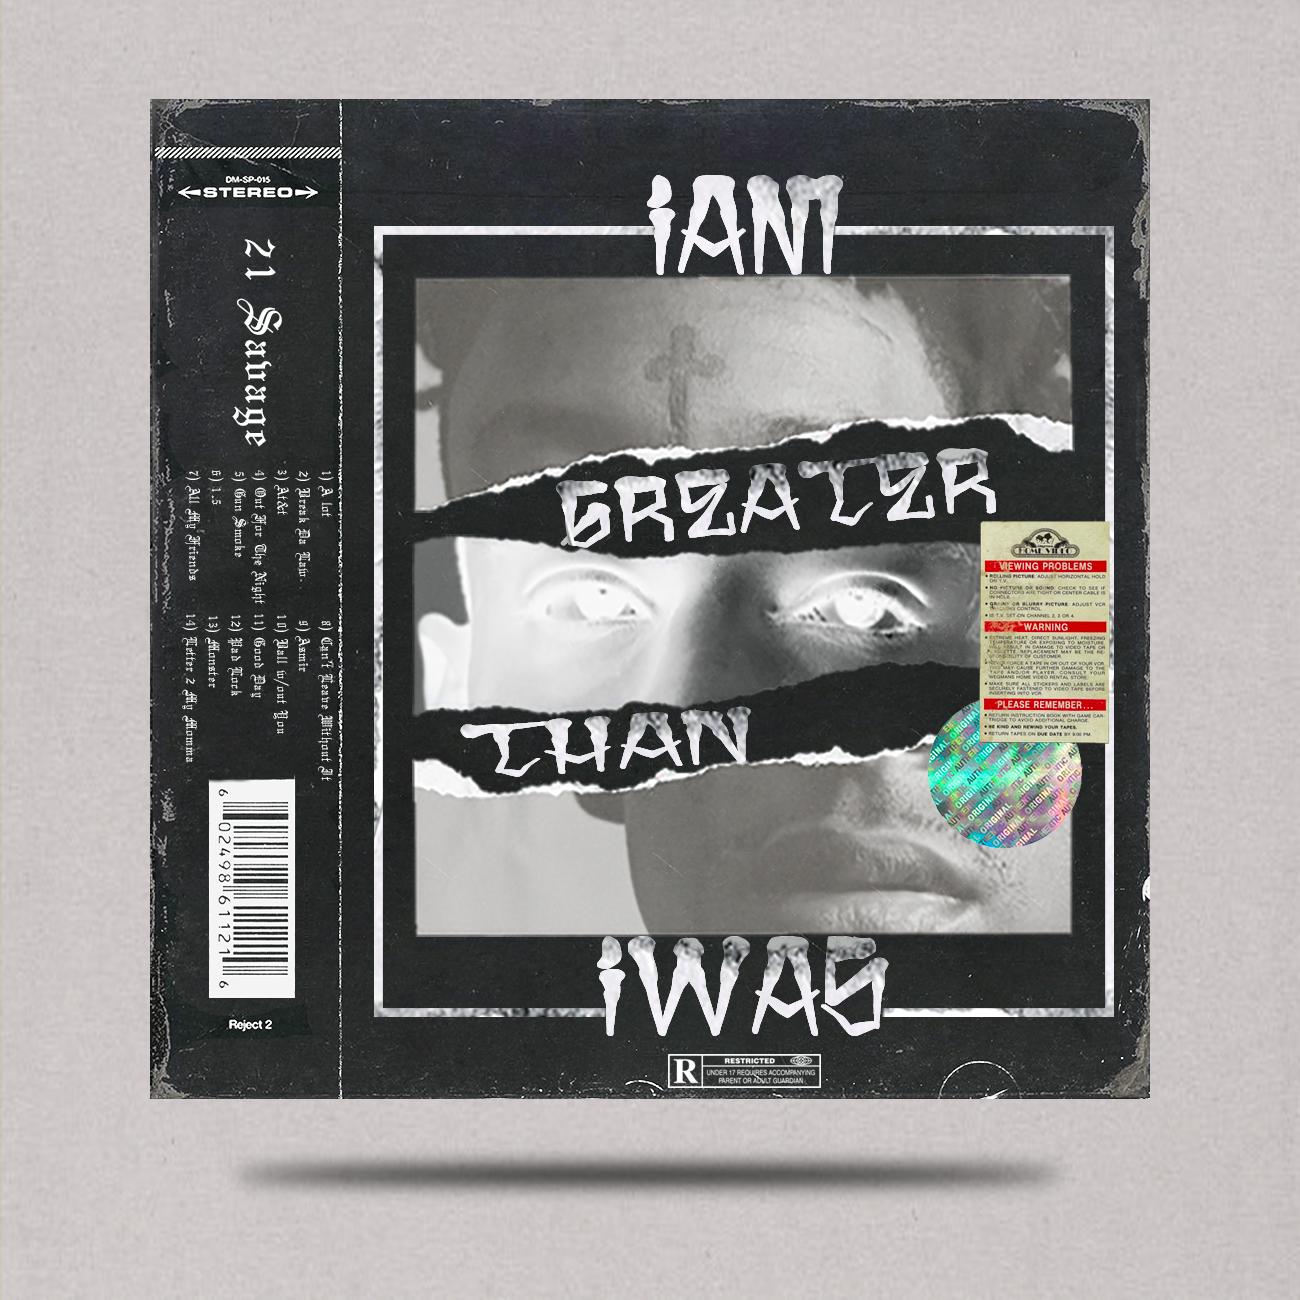 21 savage i am i was alternative artwork 21 savage vinyl store artwork alternative artwork 21 savage